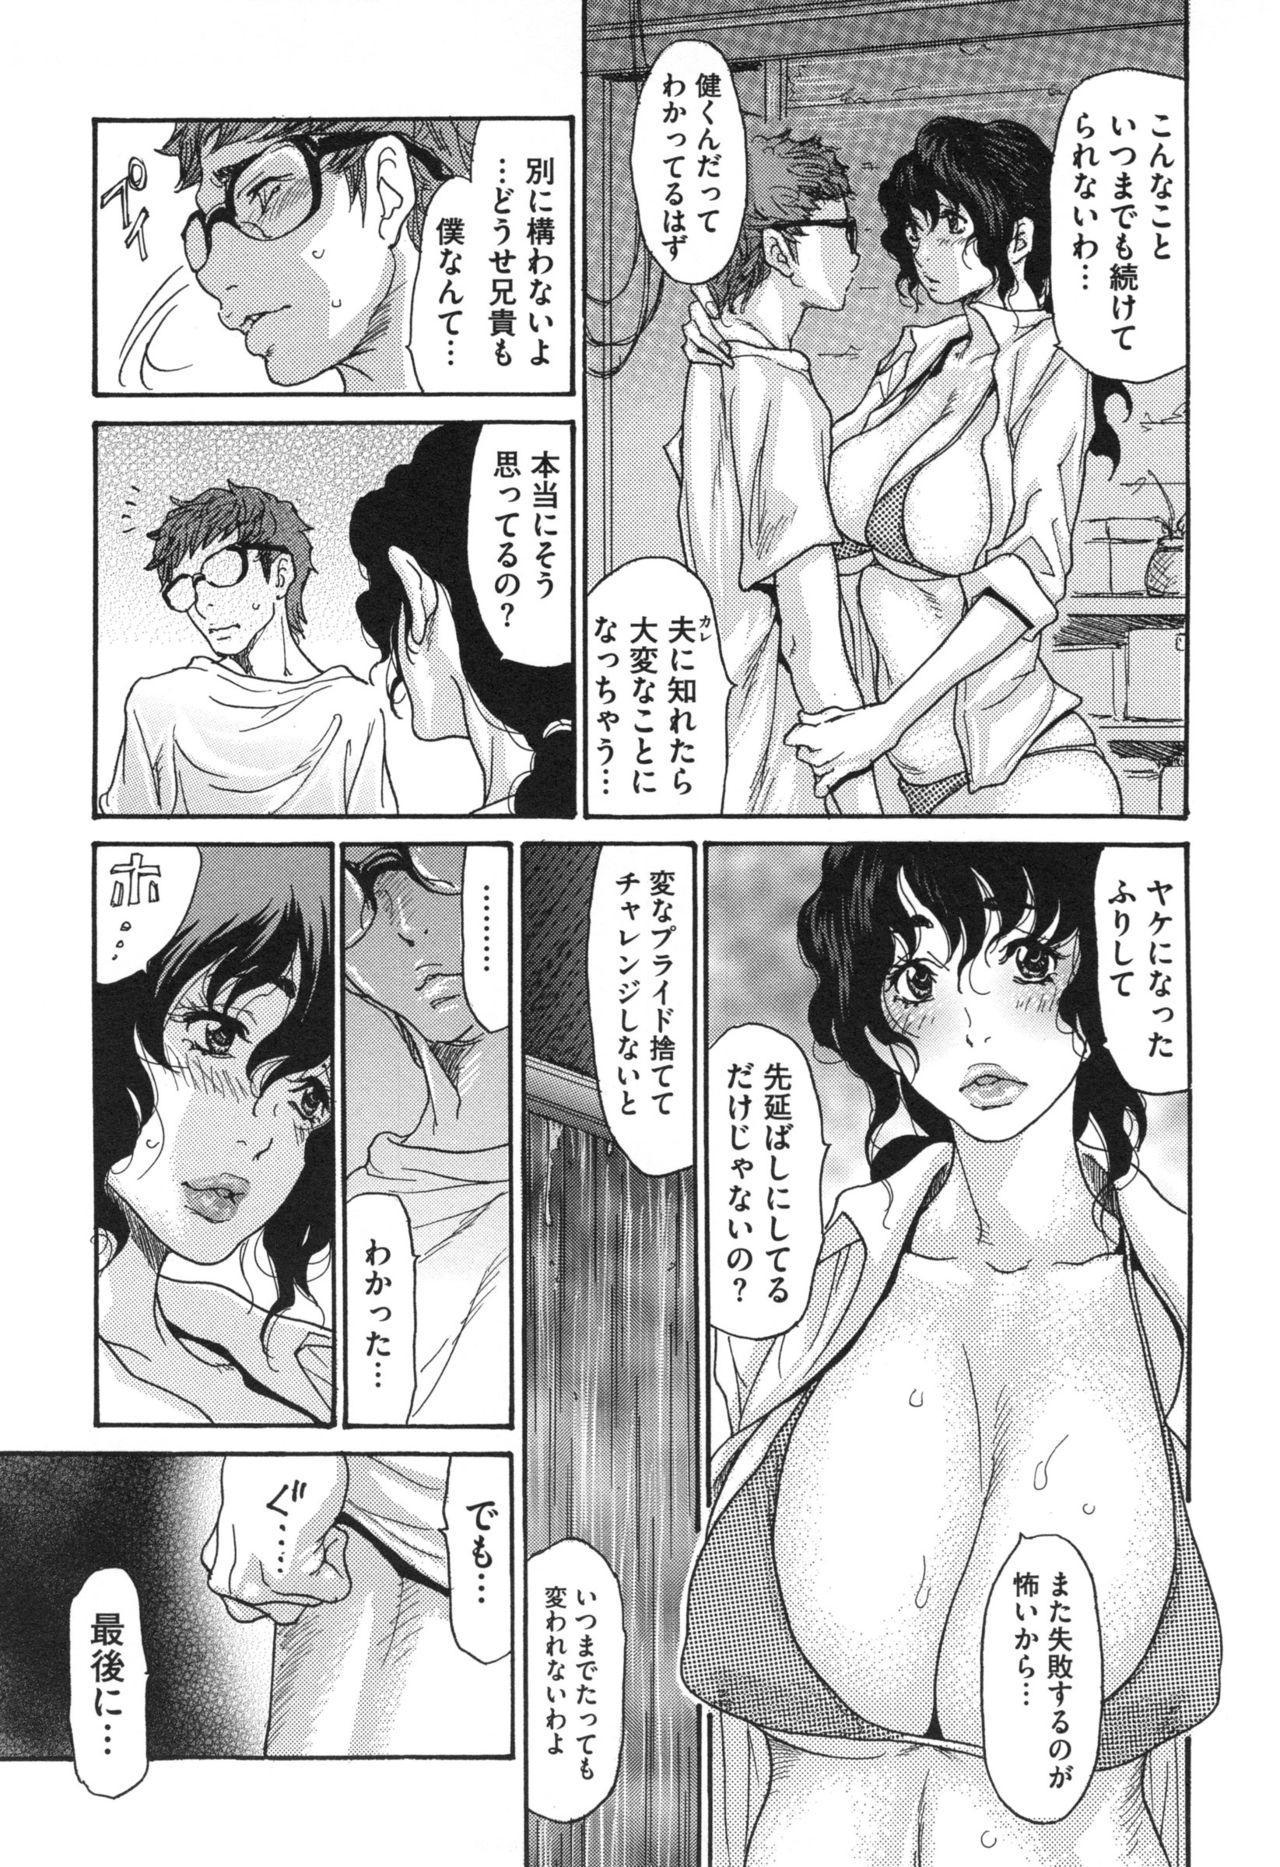 Niku-zuma Netorare Maniacs 117